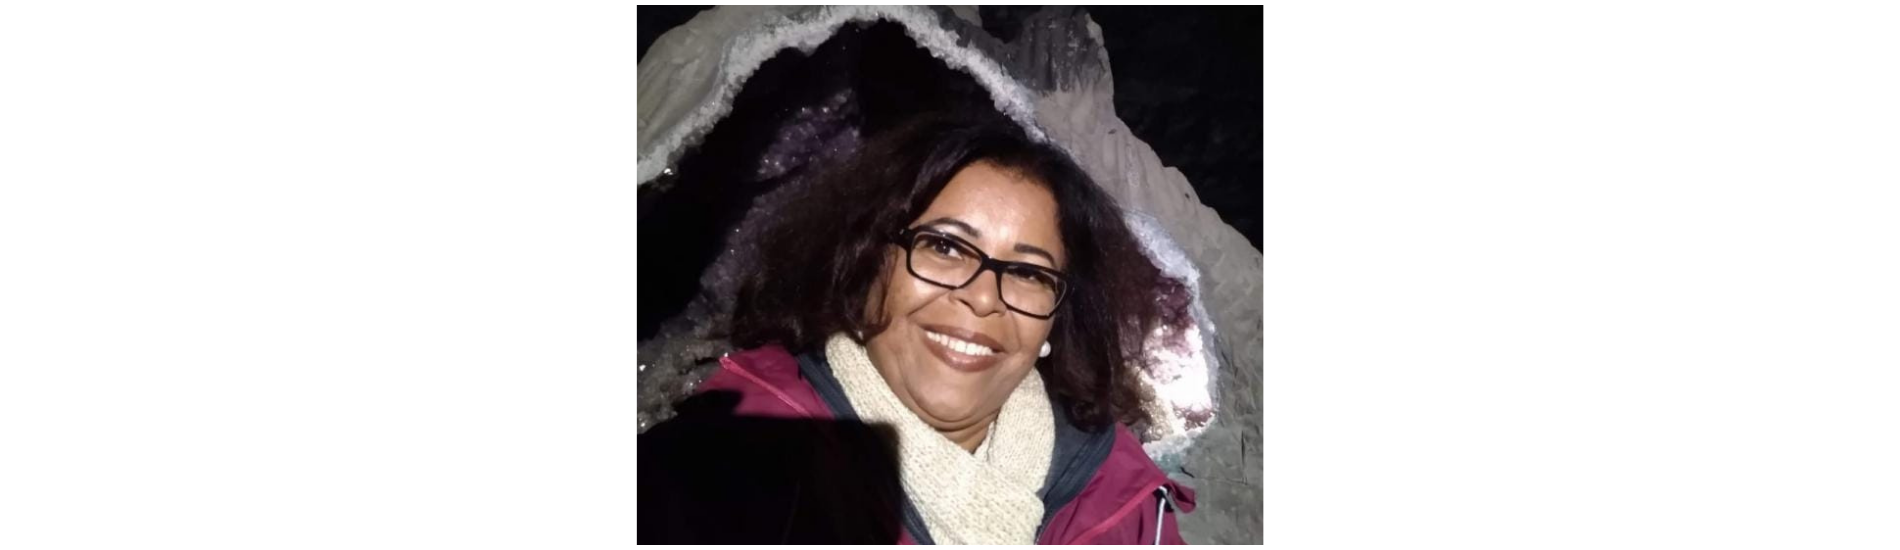 Entrevista: Marlúcia Almeida de Souza